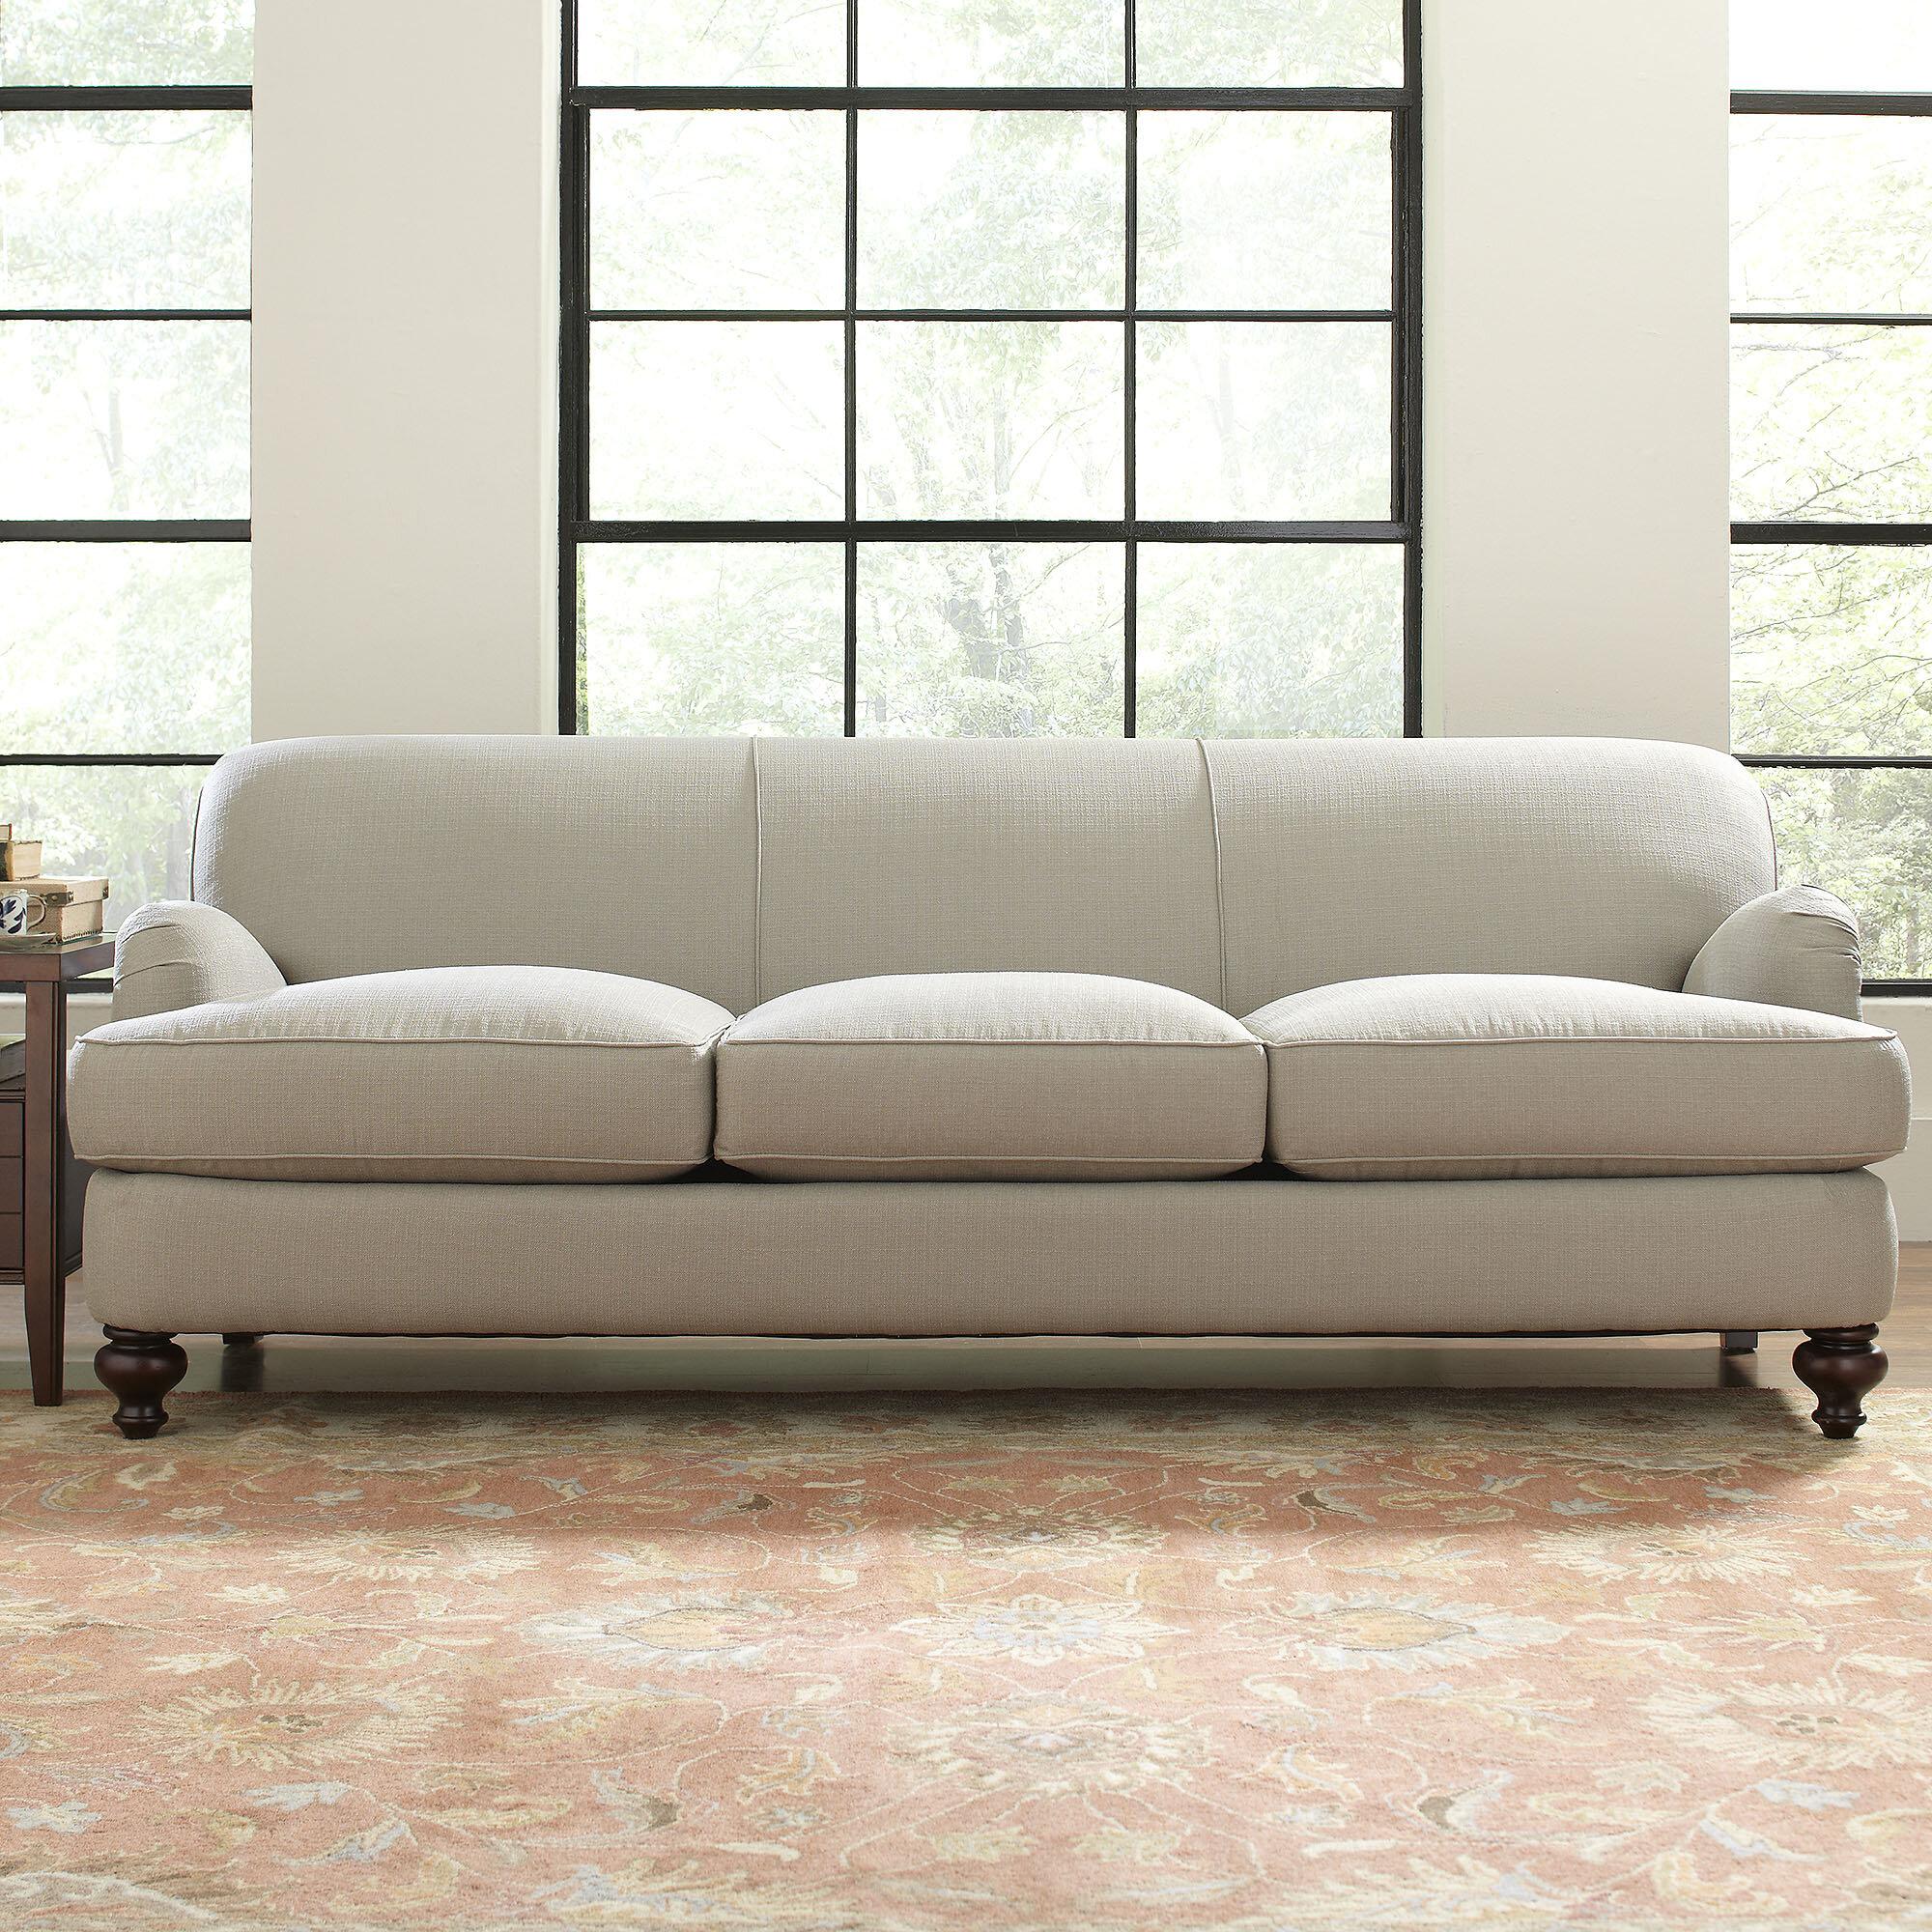 Birch LaneTM Durham Sofa Reviews